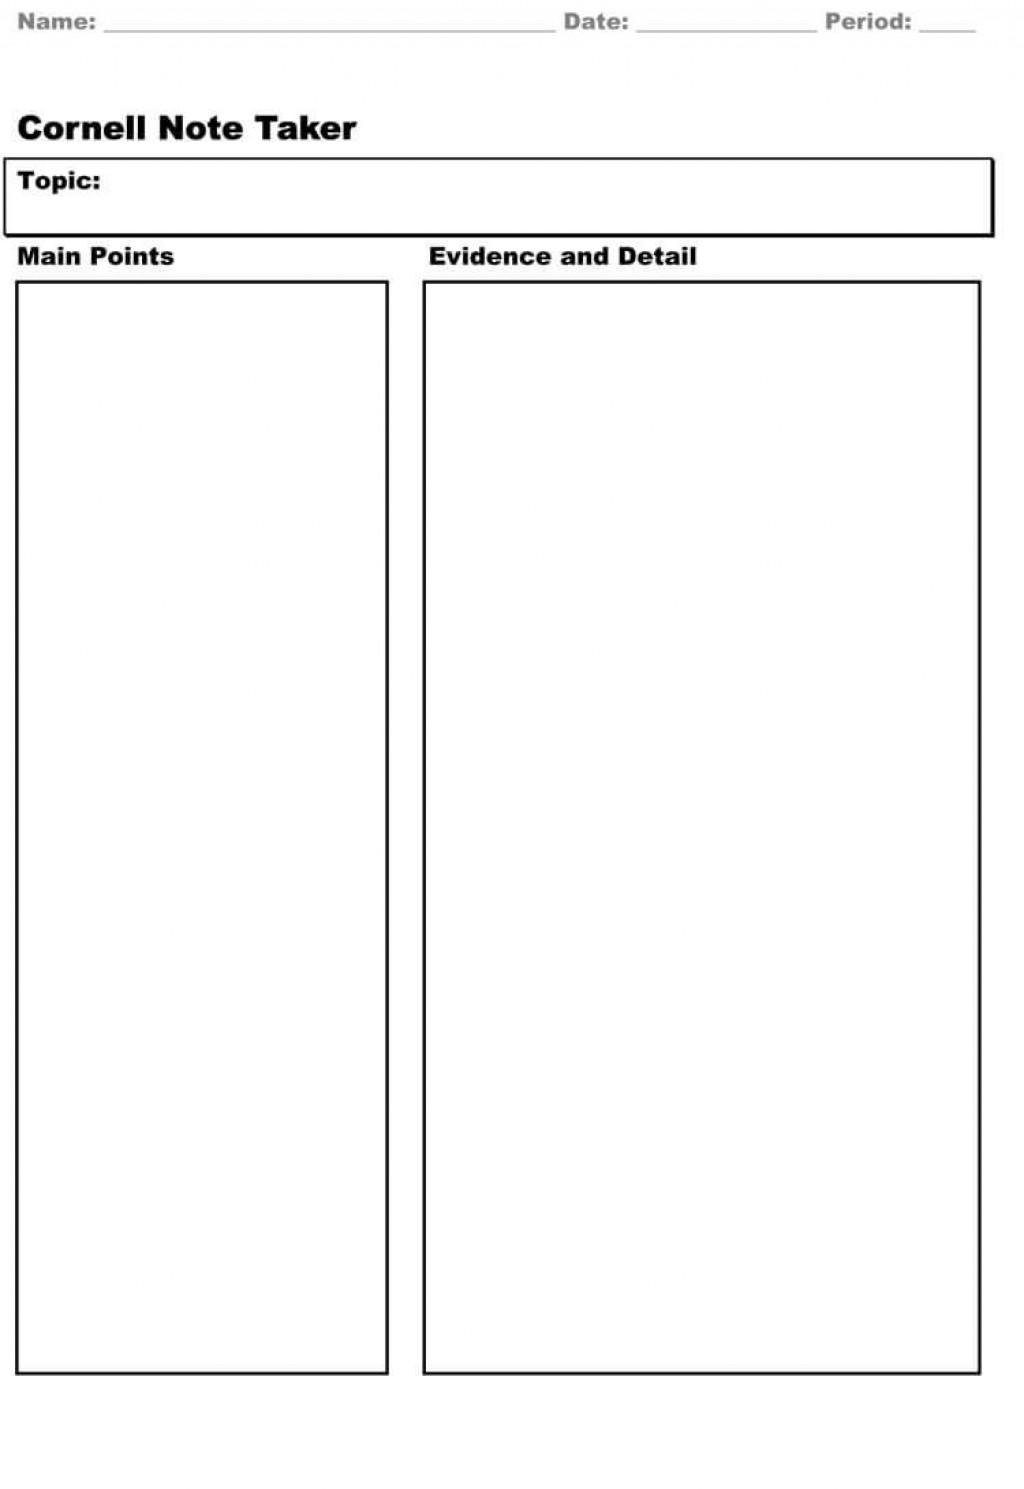 007 Imposing Note Taking Template Word Example  Microsoft Cornell Doc MethodLarge